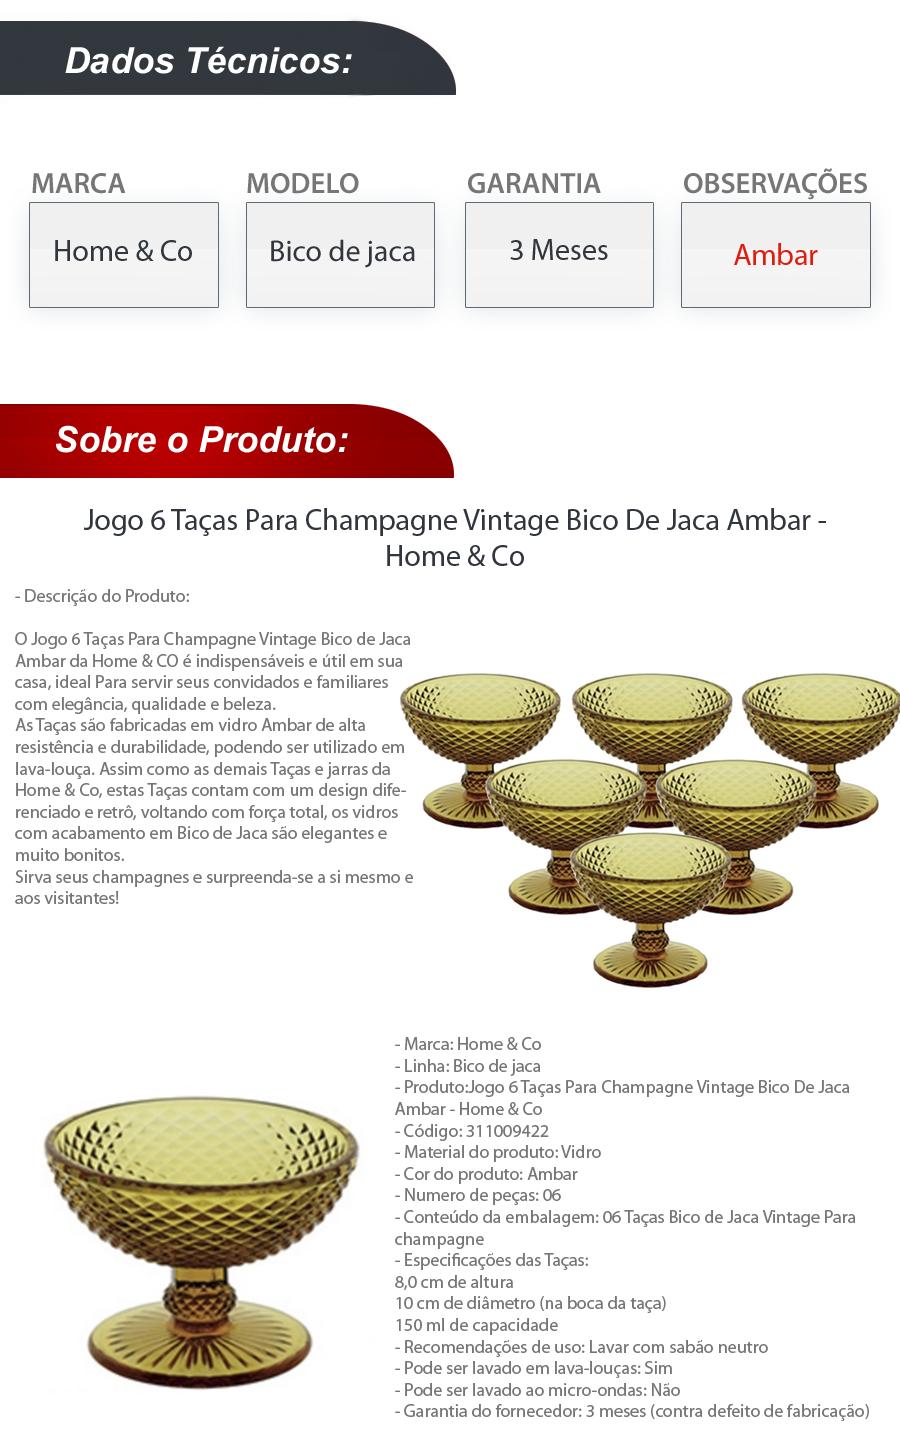 Jogo 6 Taças Champagne Vintage Bico De Jaca Ambar Home & Co